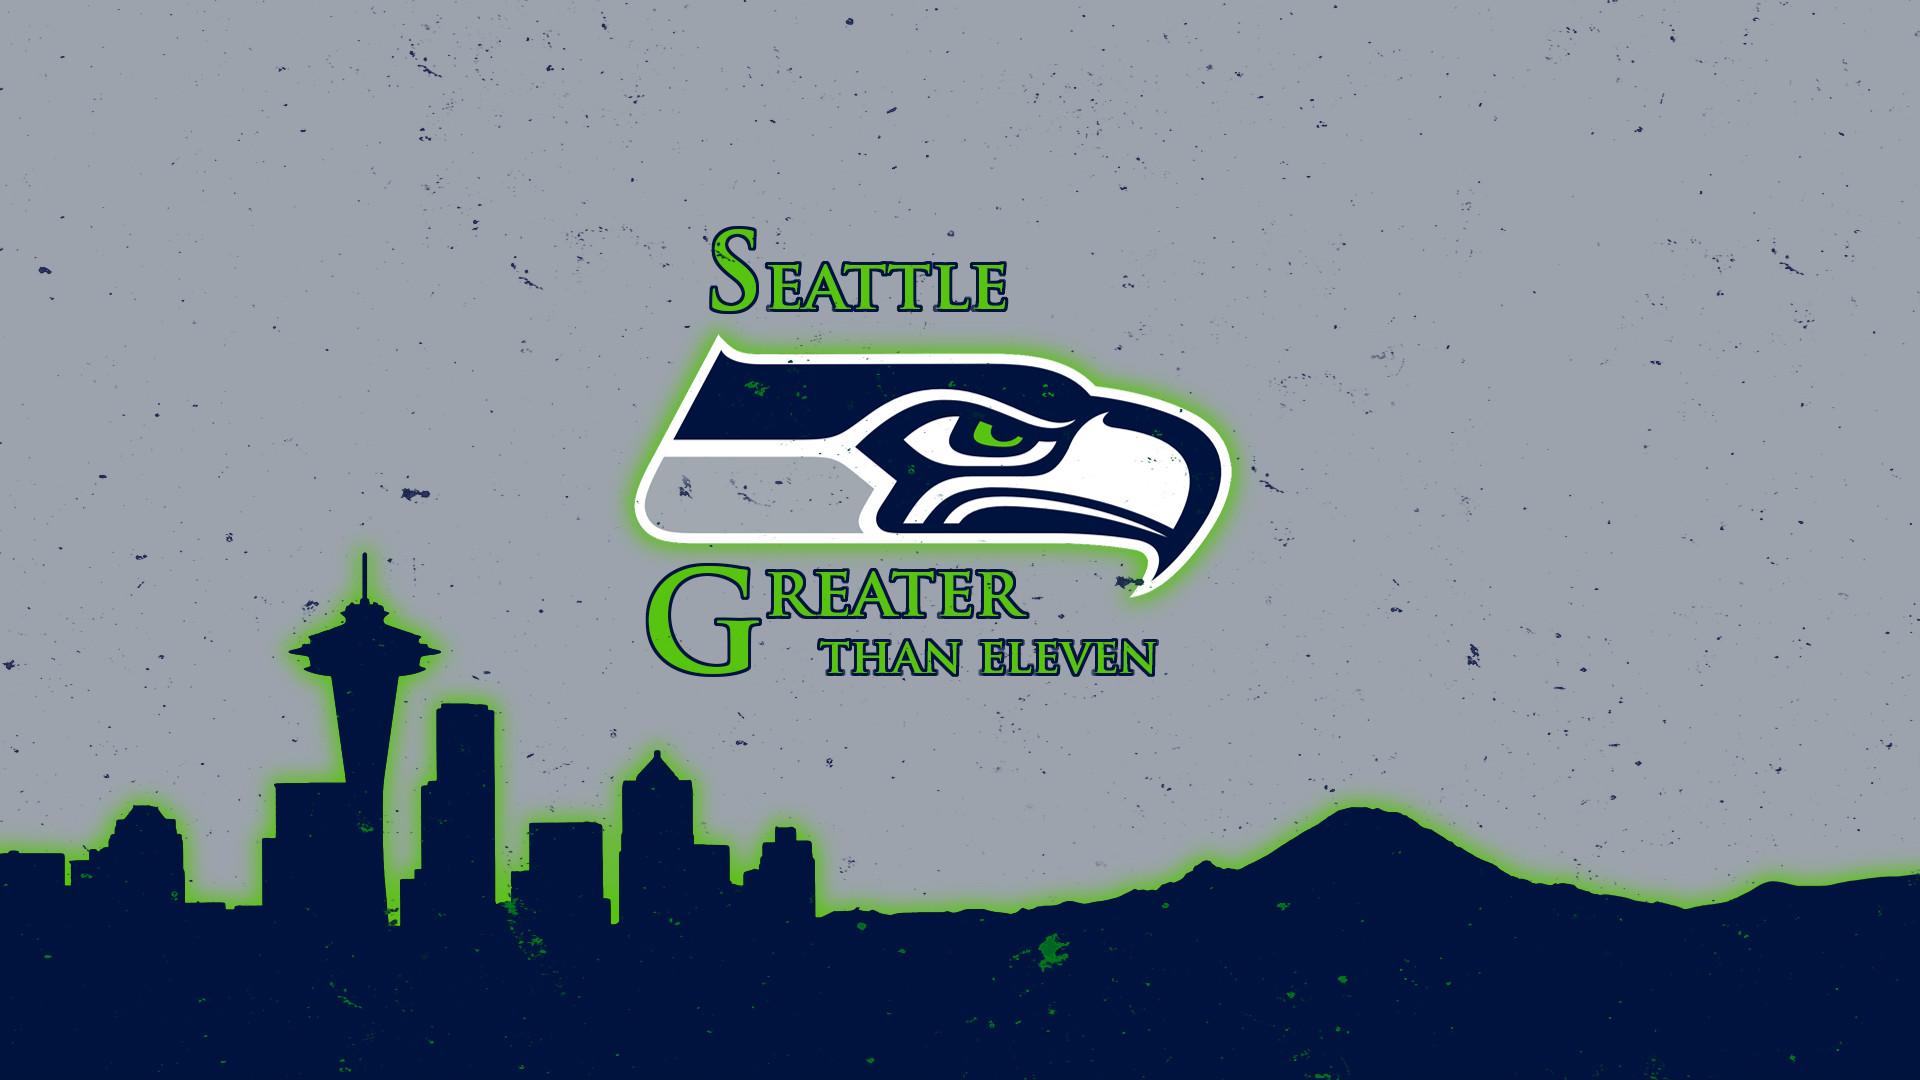 2013 Seattle Seahawks nfl football y wallpaper background